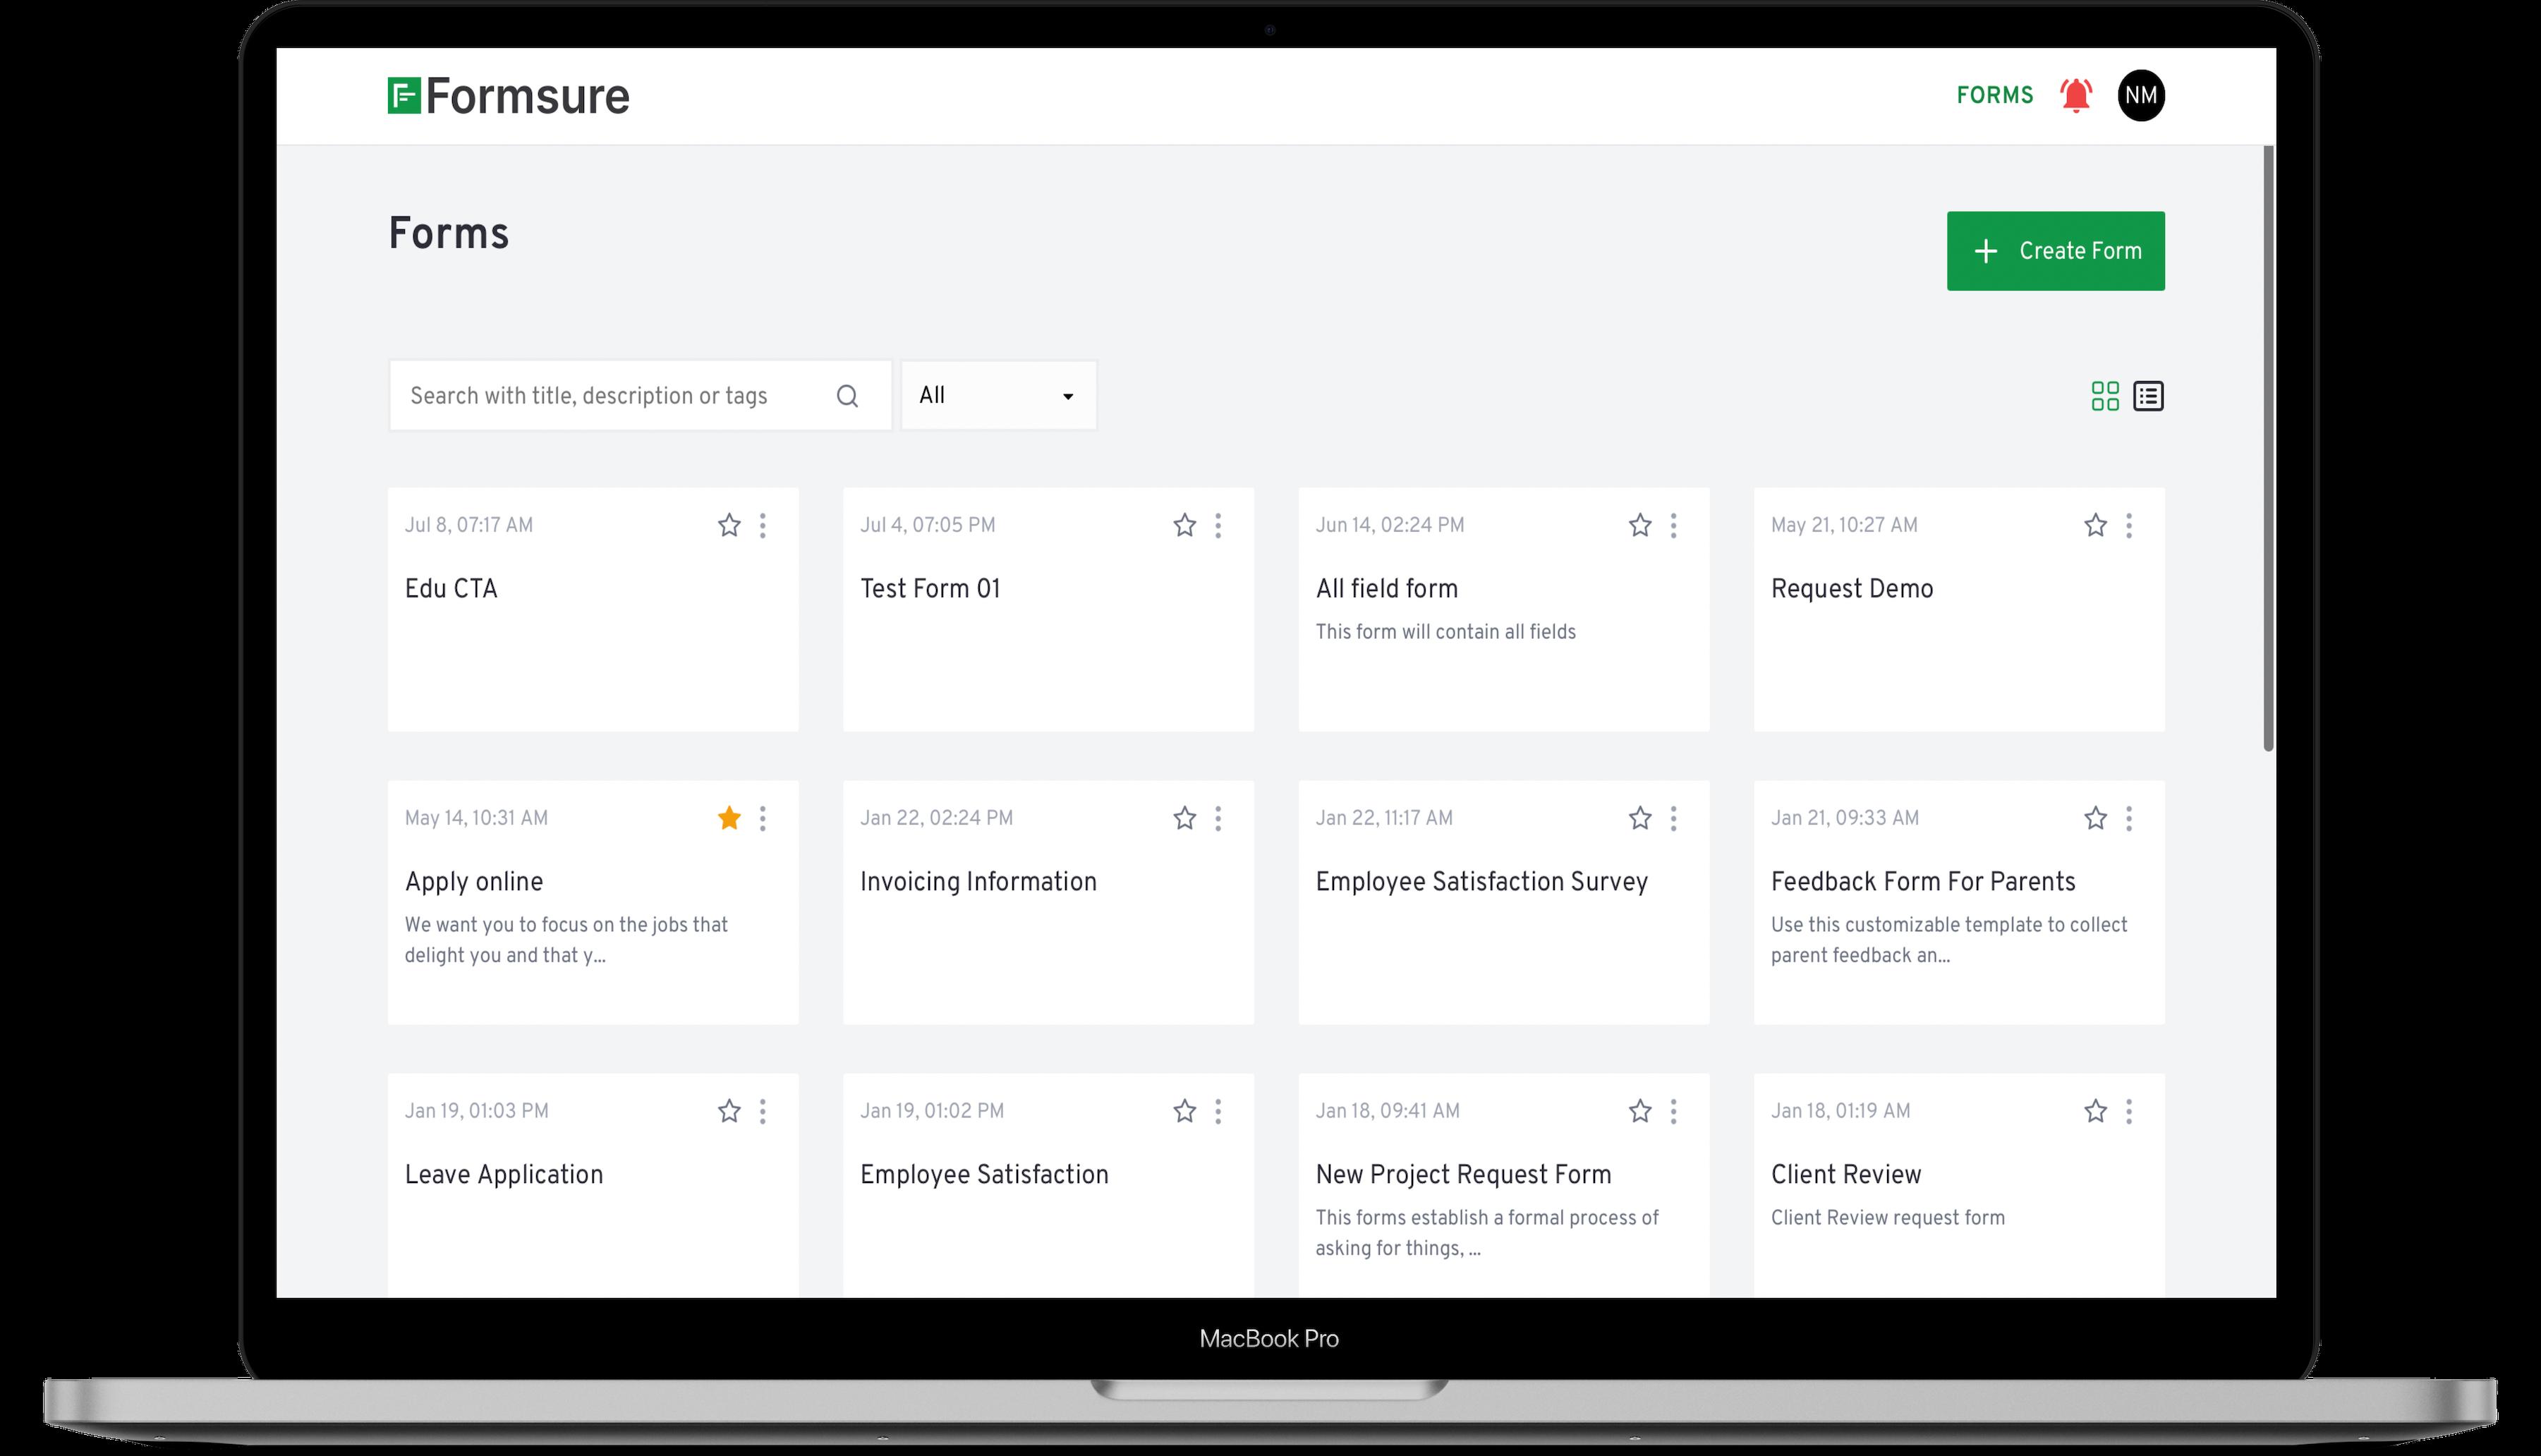 Form builder for surveys, polls, and quizzes